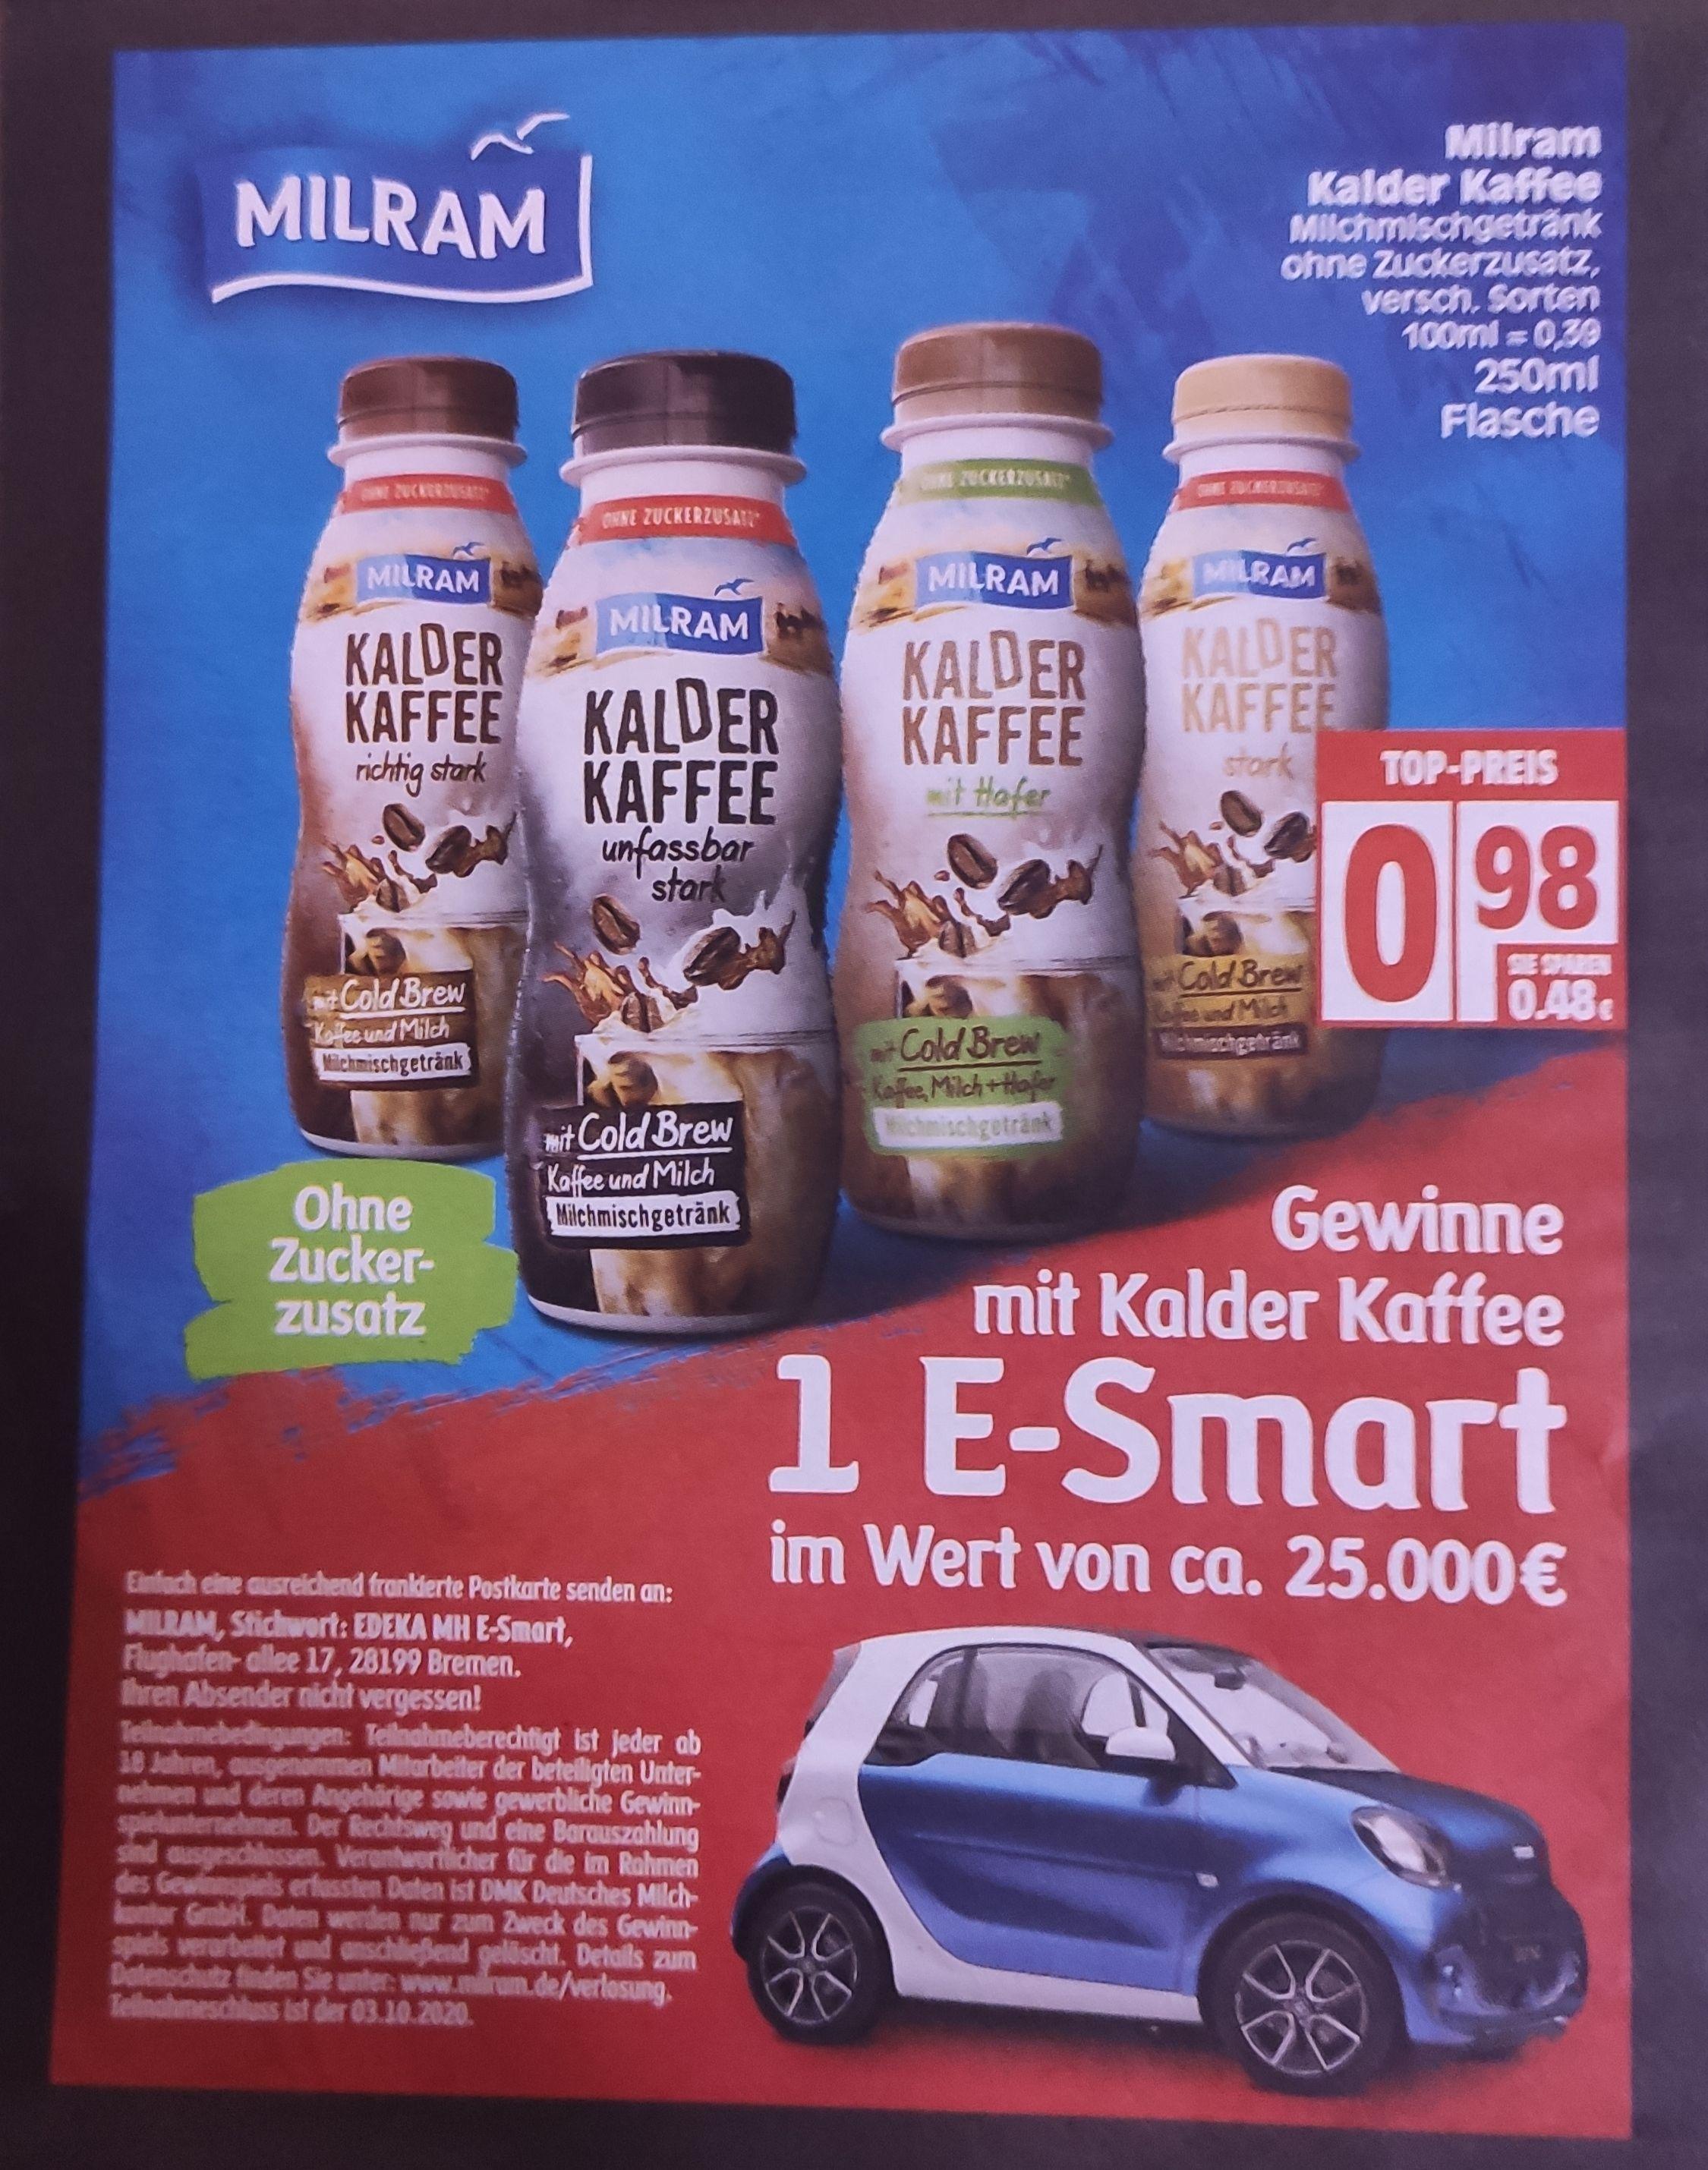 [Edeka Minden-Hannover] Kalder Kaffee mit Coupon für 0,48€